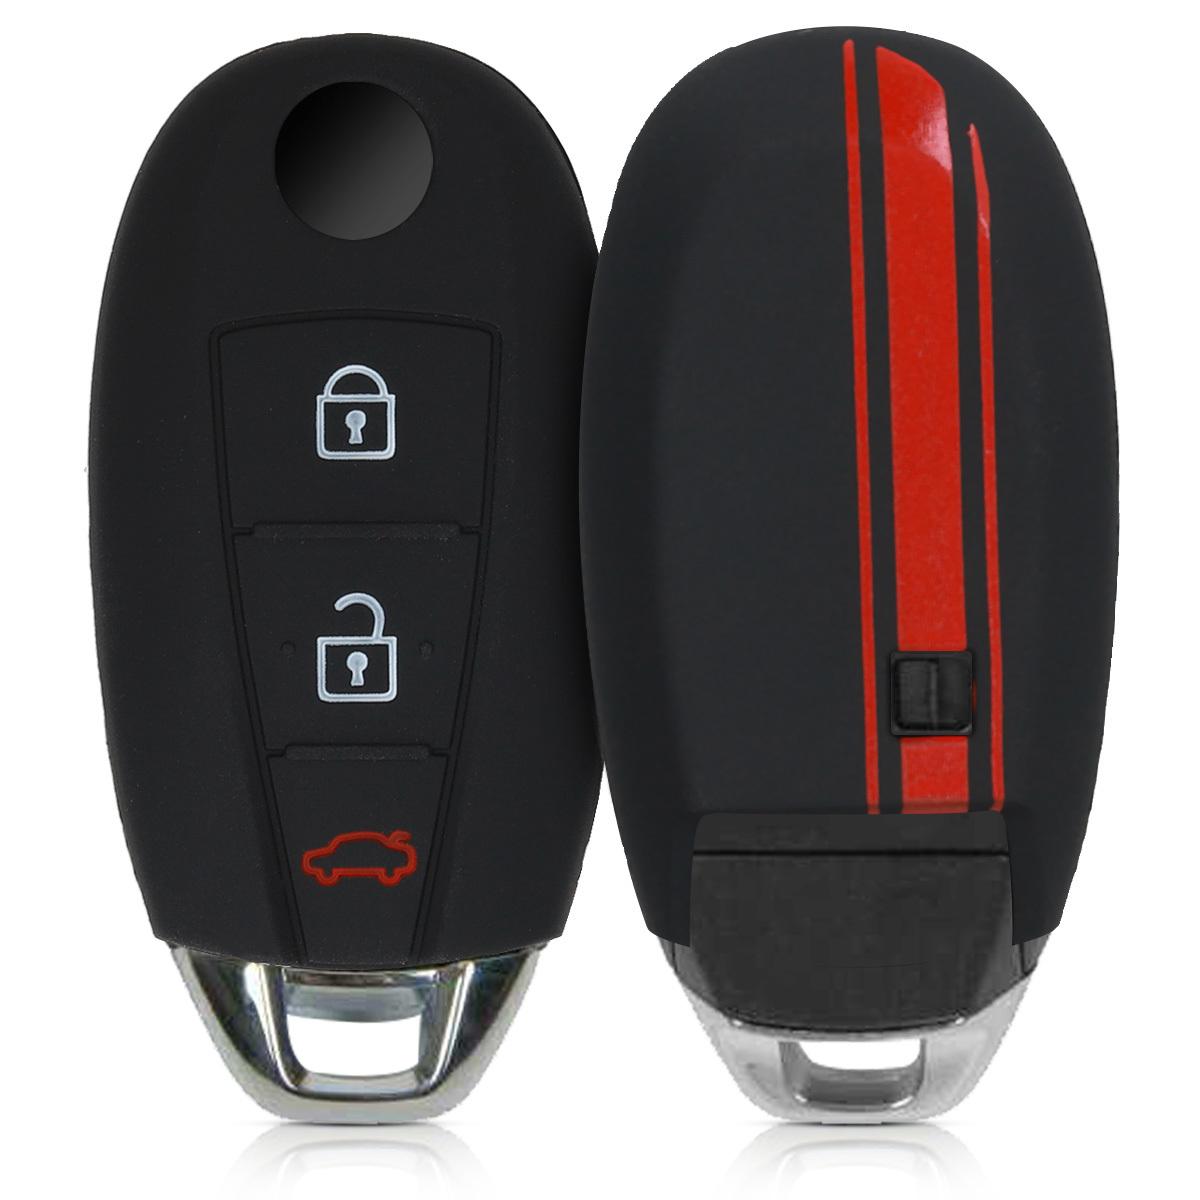 KW Θήκη Κλειδιού Suzuki -Σιλικόνη - 3 Κουμπιά - Keyless Go - Red / Black (49770.02)